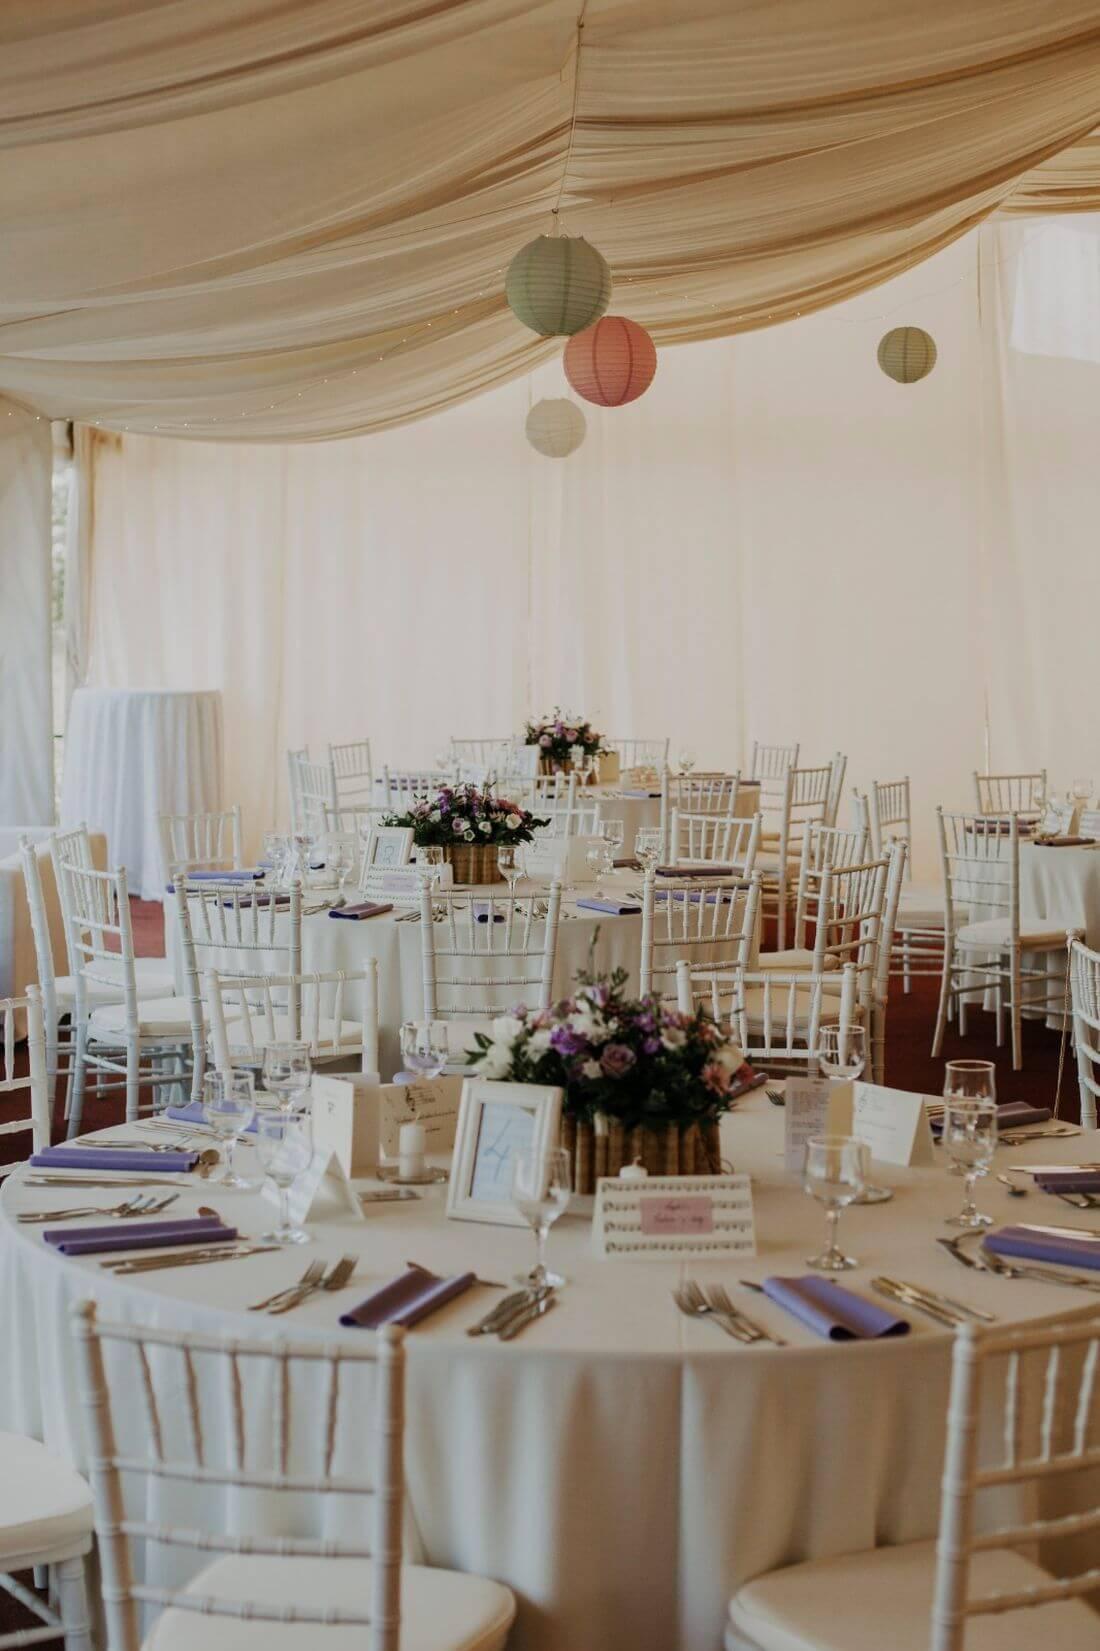 Nunta pe note muzicale – Ana-Maria si Robert – IDO-Weddings-nuntiinaerliber (15)